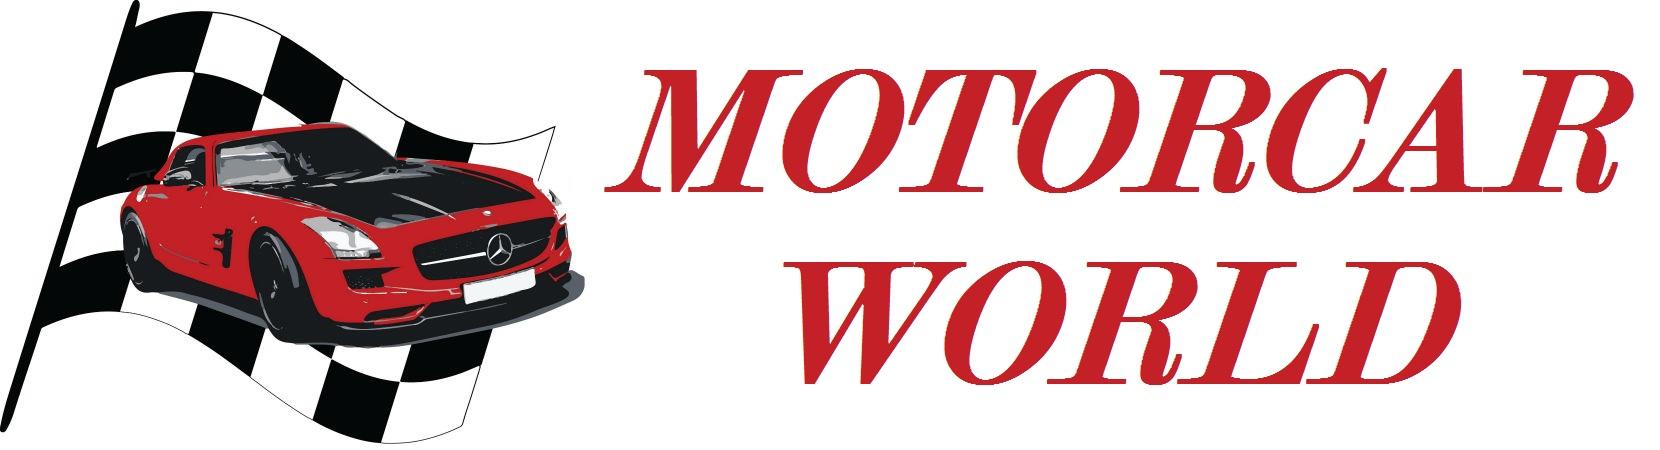 Motorcar World